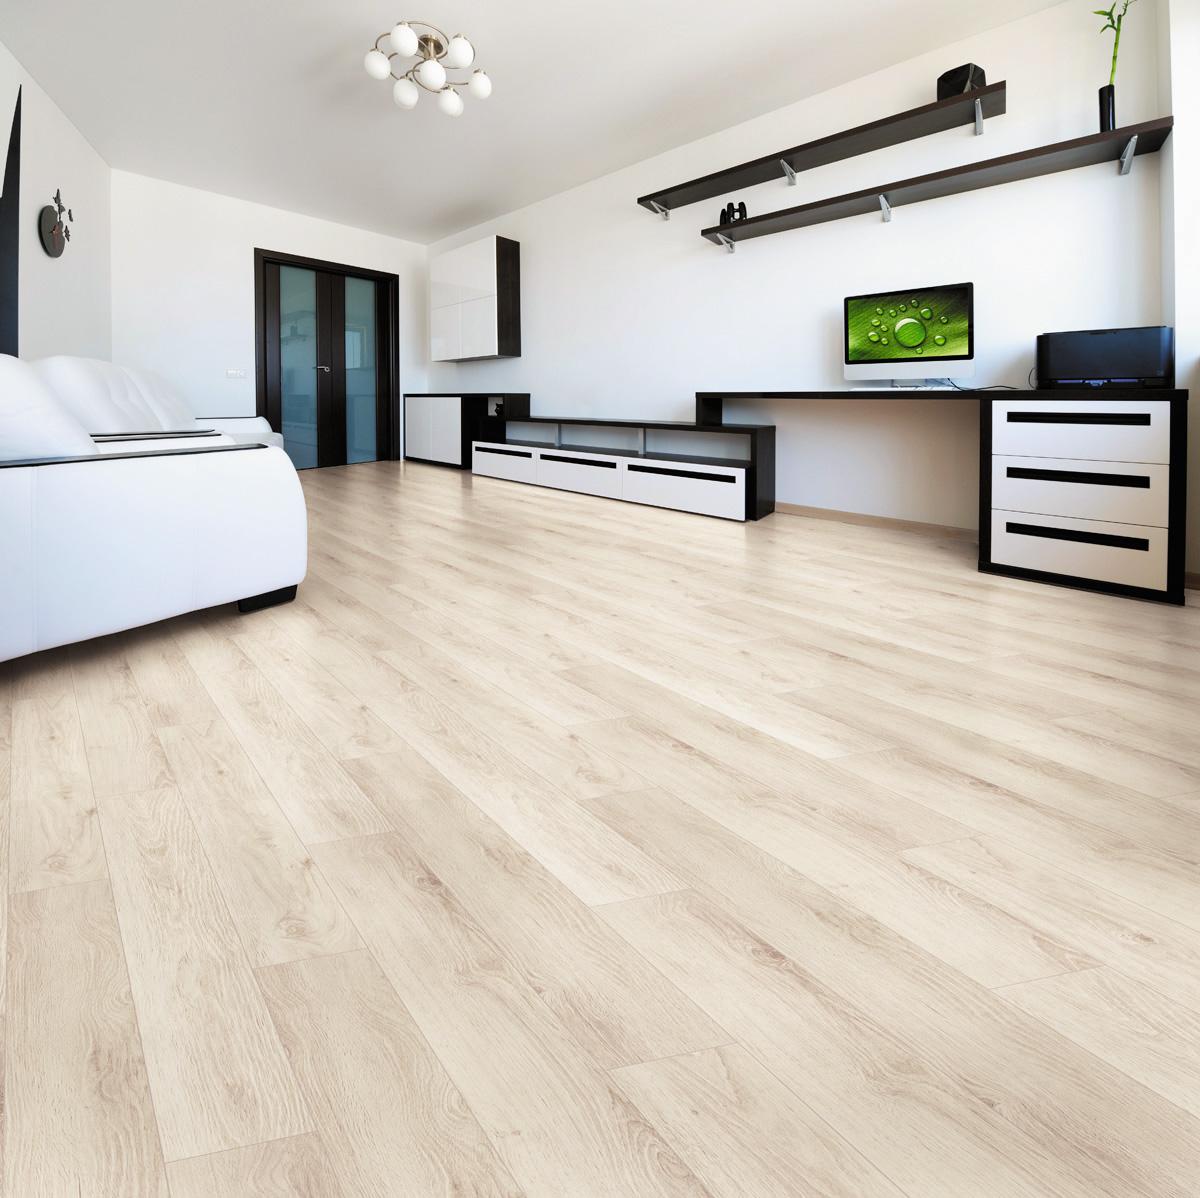 classen maestro cantata 34866 oak vanilla. Black Bedroom Furniture Sets. Home Design Ideas